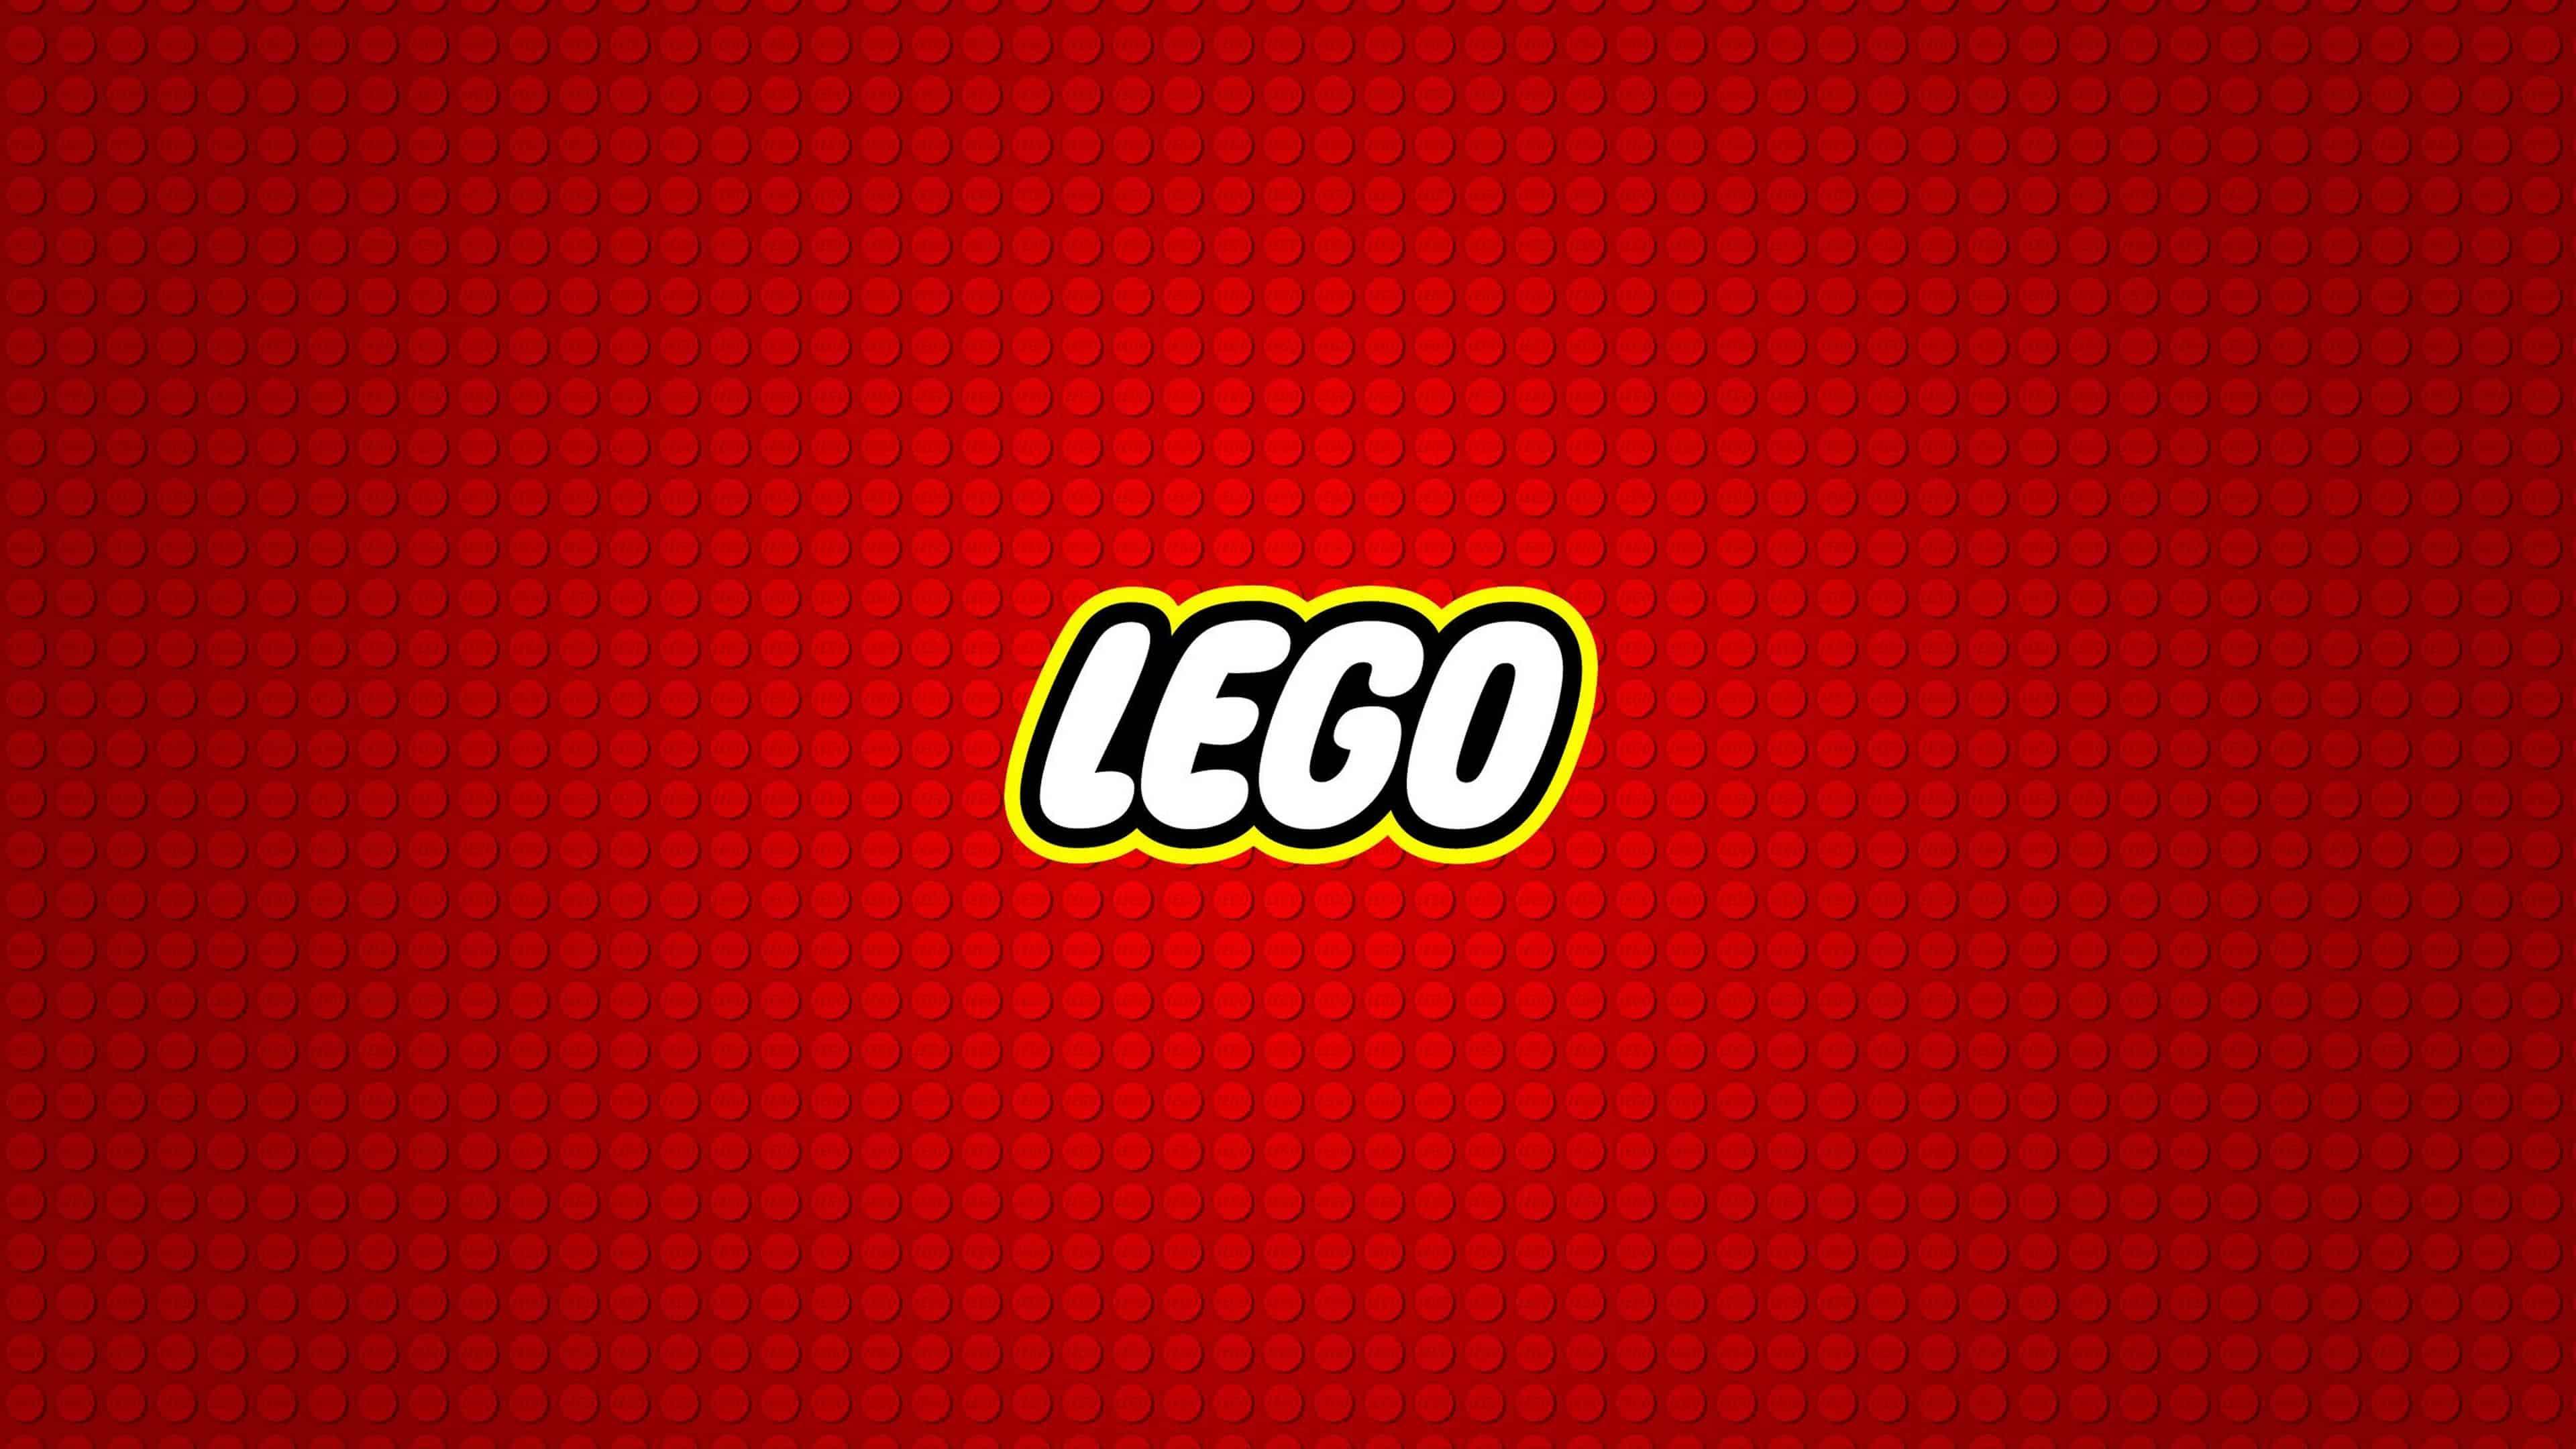 lego logo red background uhd 4k wallpaper